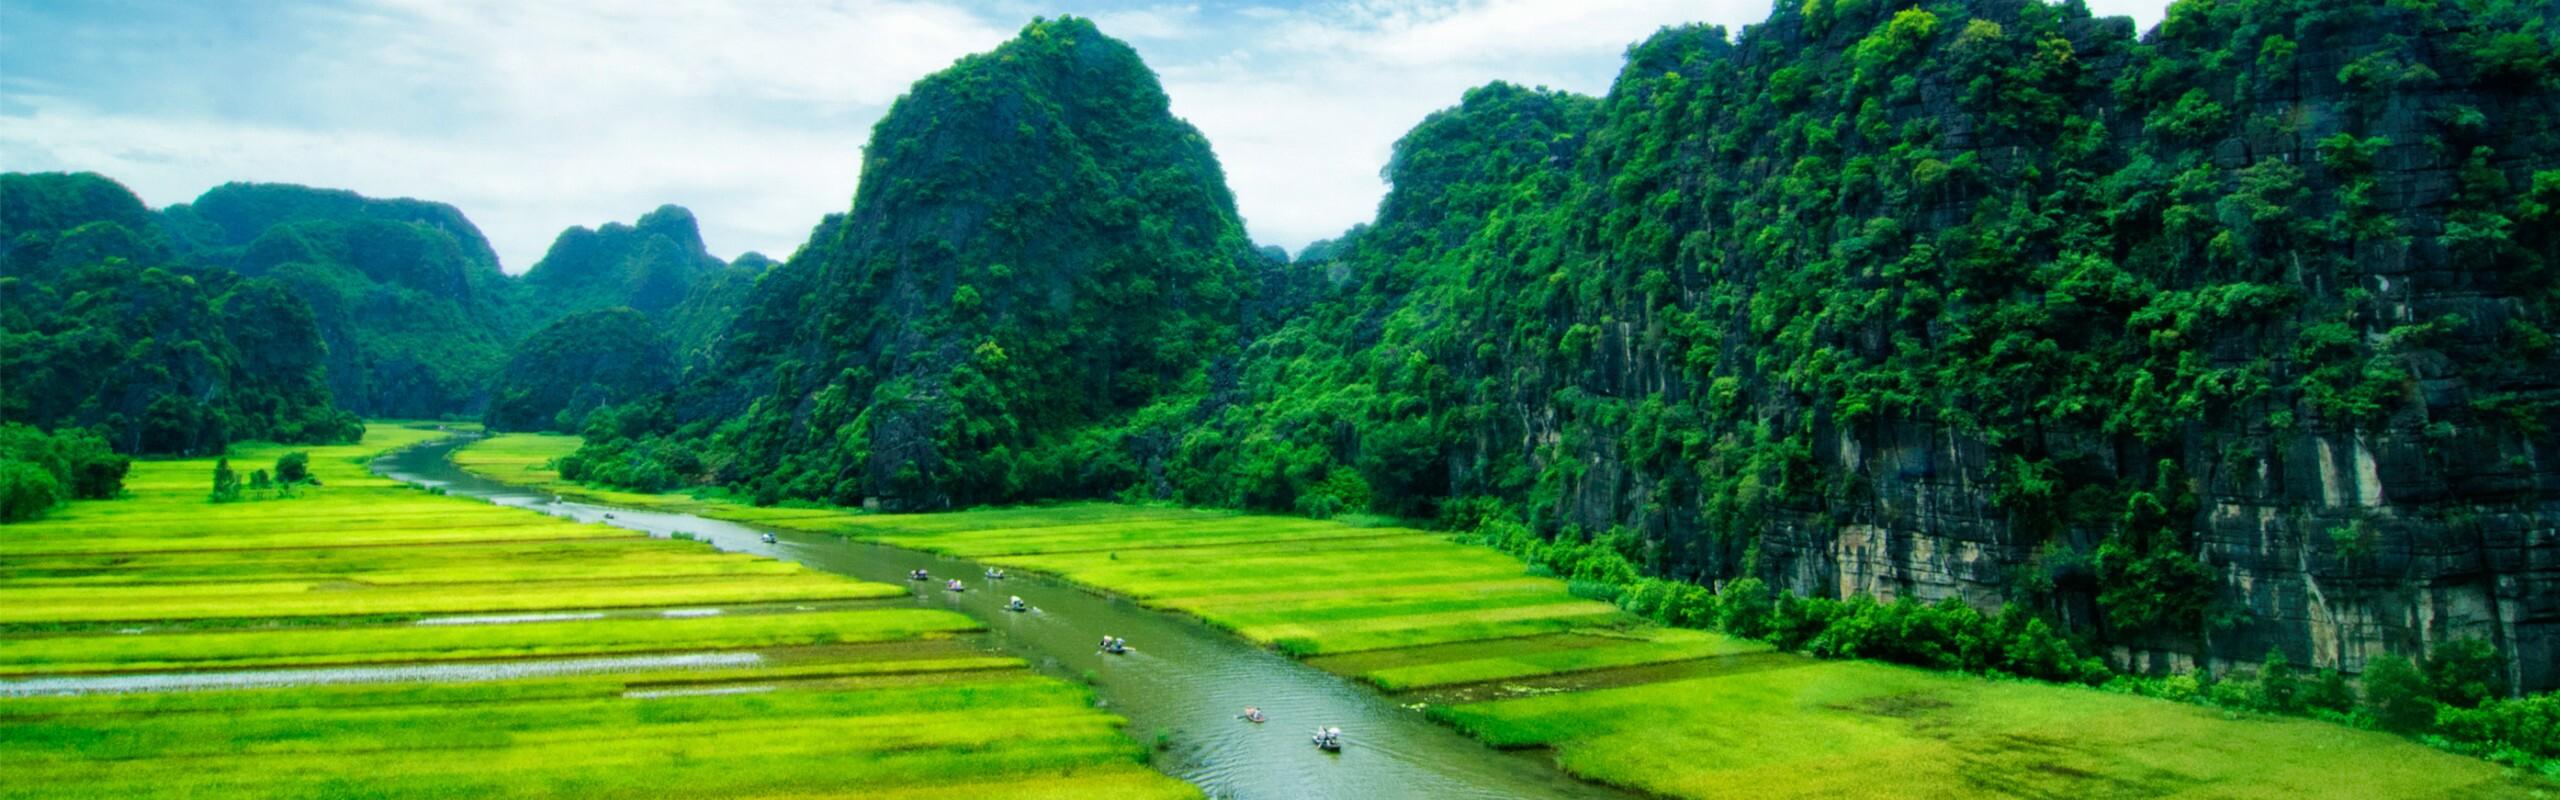 Ninh Binh Travel Guide: Weather, Tours, Transport